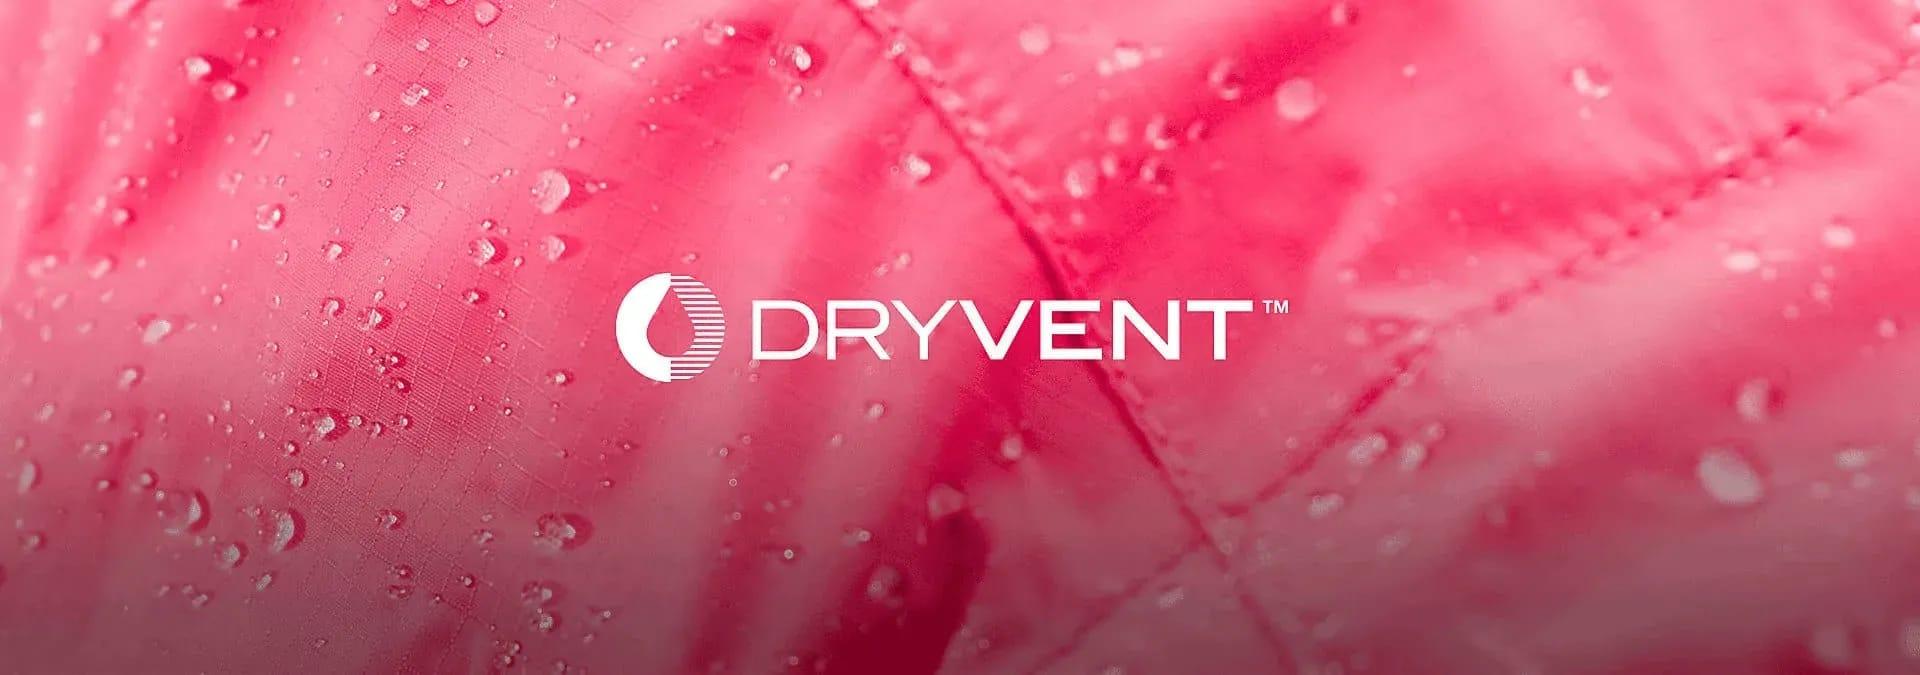 dryvent technology